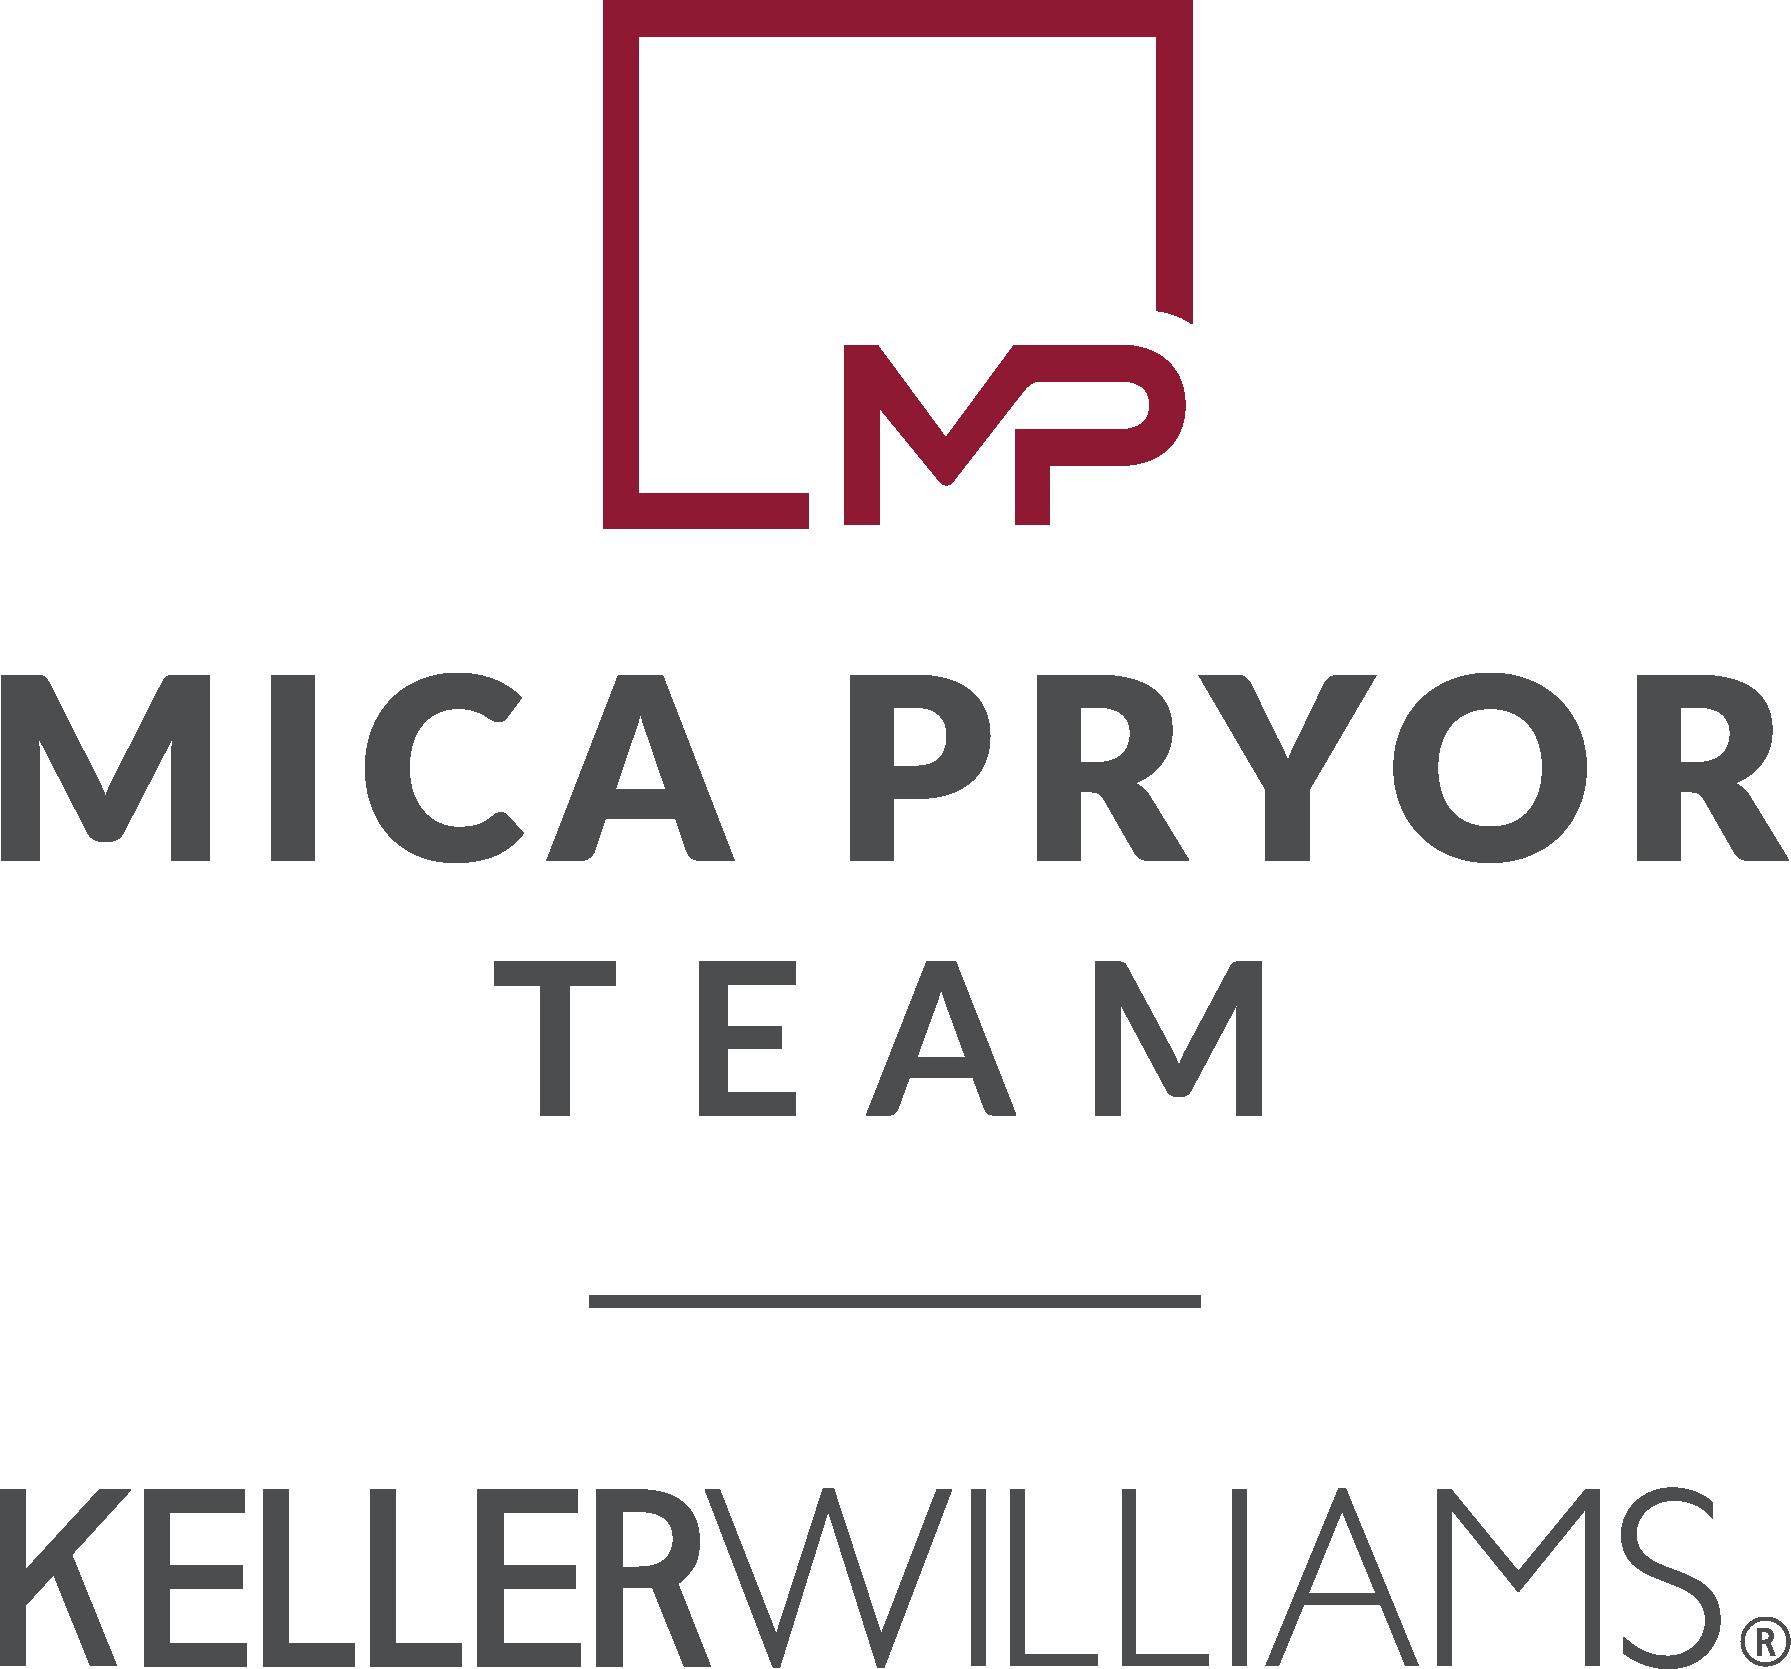 Mica Pryor Team | Keller Williams